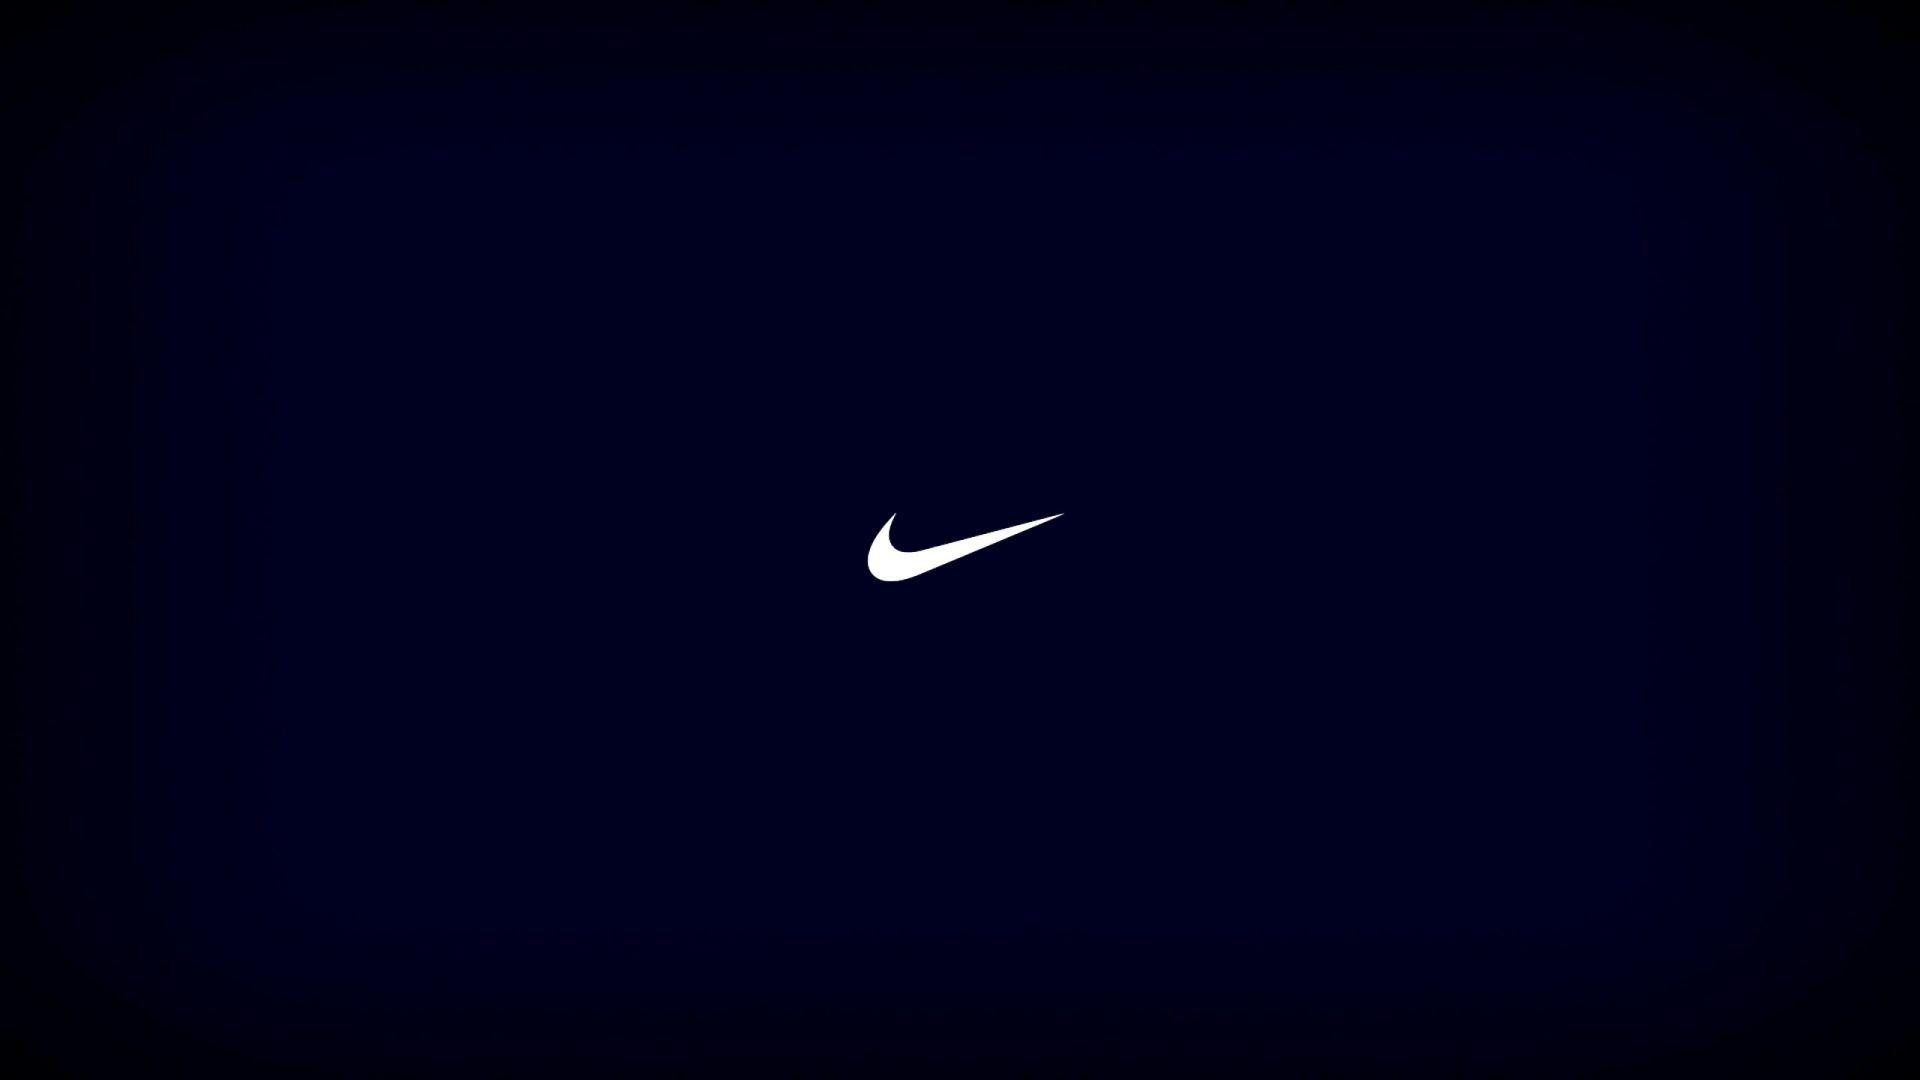 Pics Photos   Nike Logo Blue Wallpaper Hd Wallpaper 1920x1080